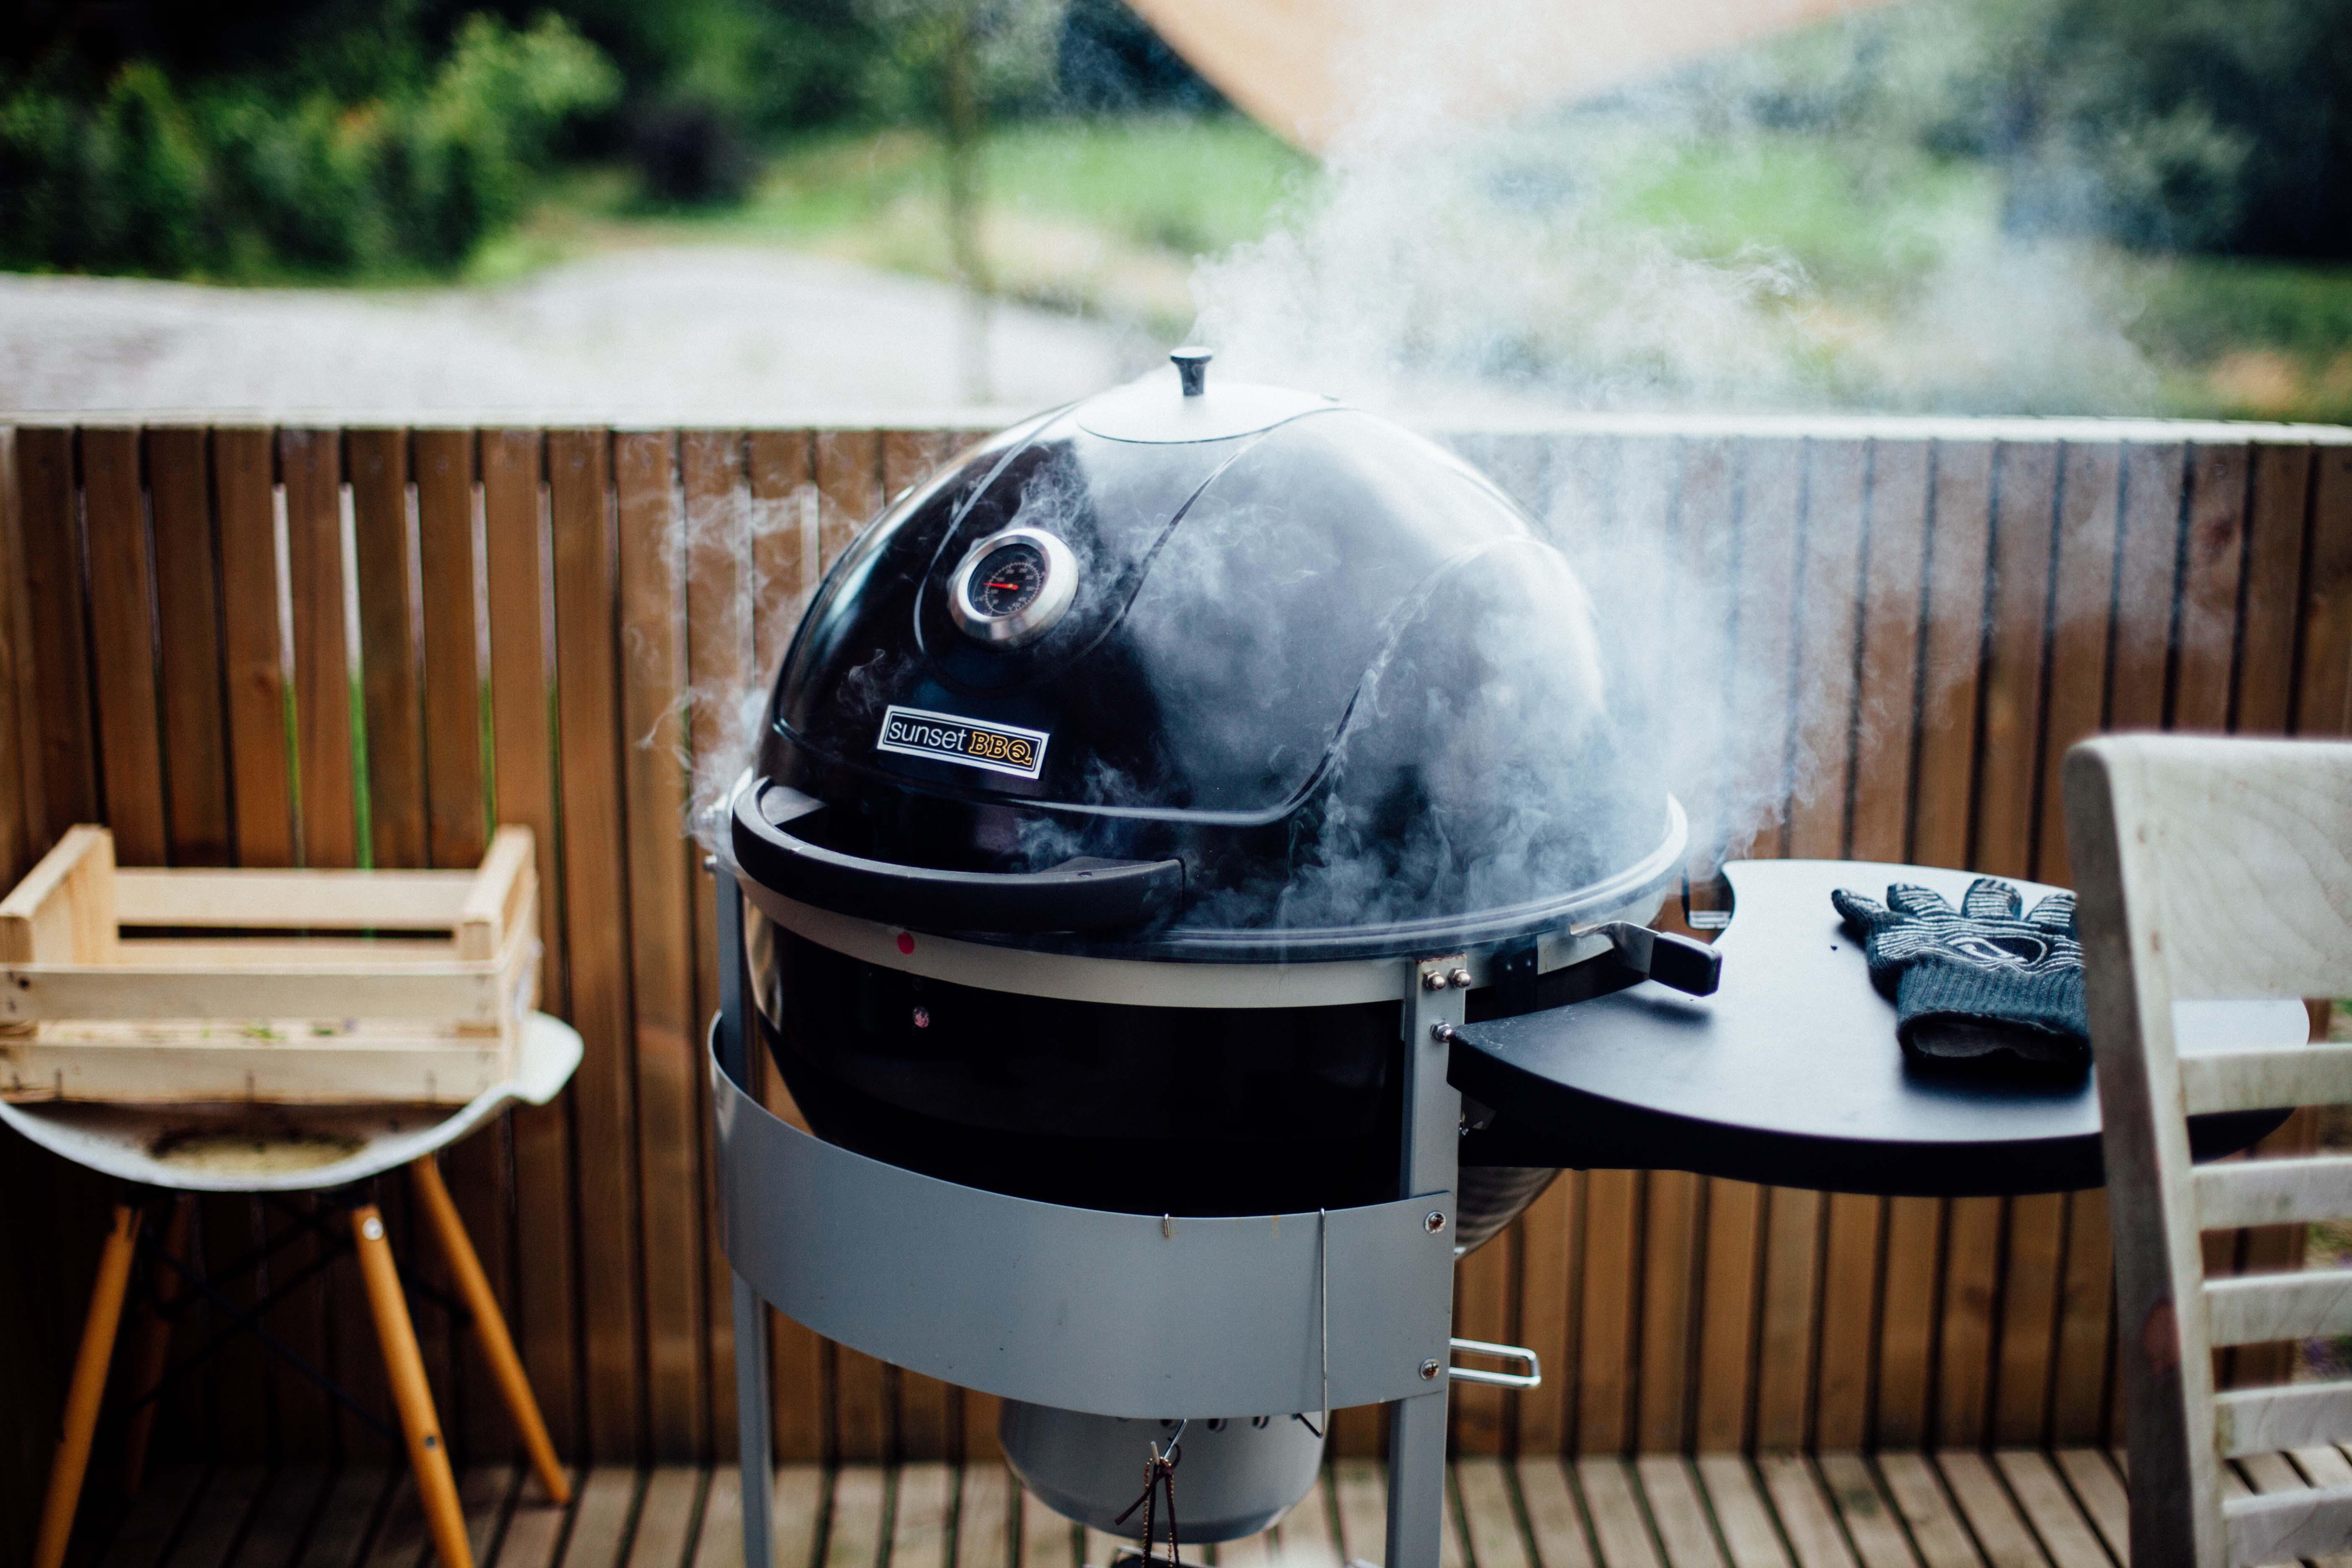 exemple de barbecue sultan barbecue au gaz gris brleurs. Black Bedroom Furniture Sets. Home Design Ideas